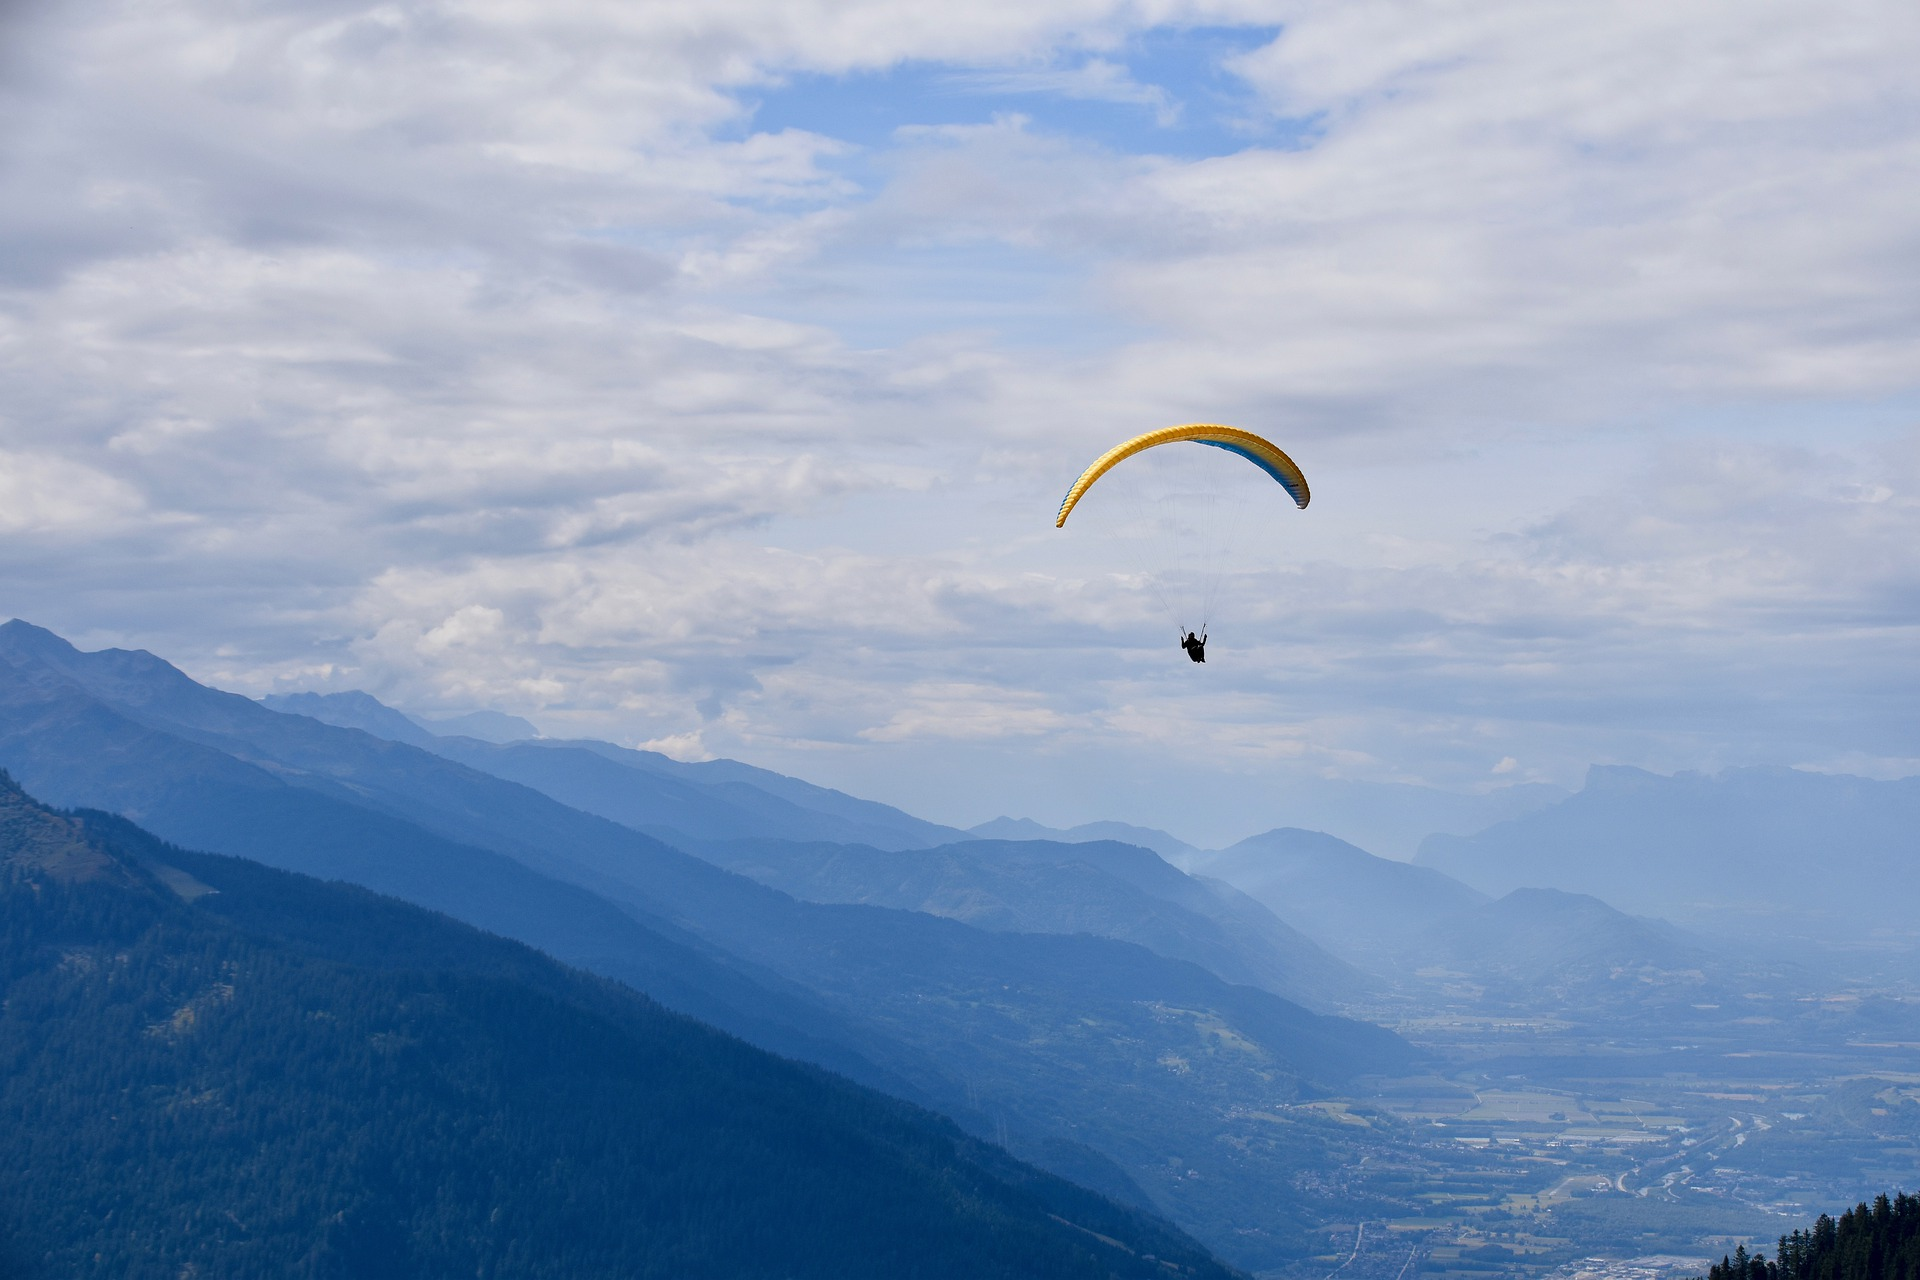 Un vol en parapente en montagne